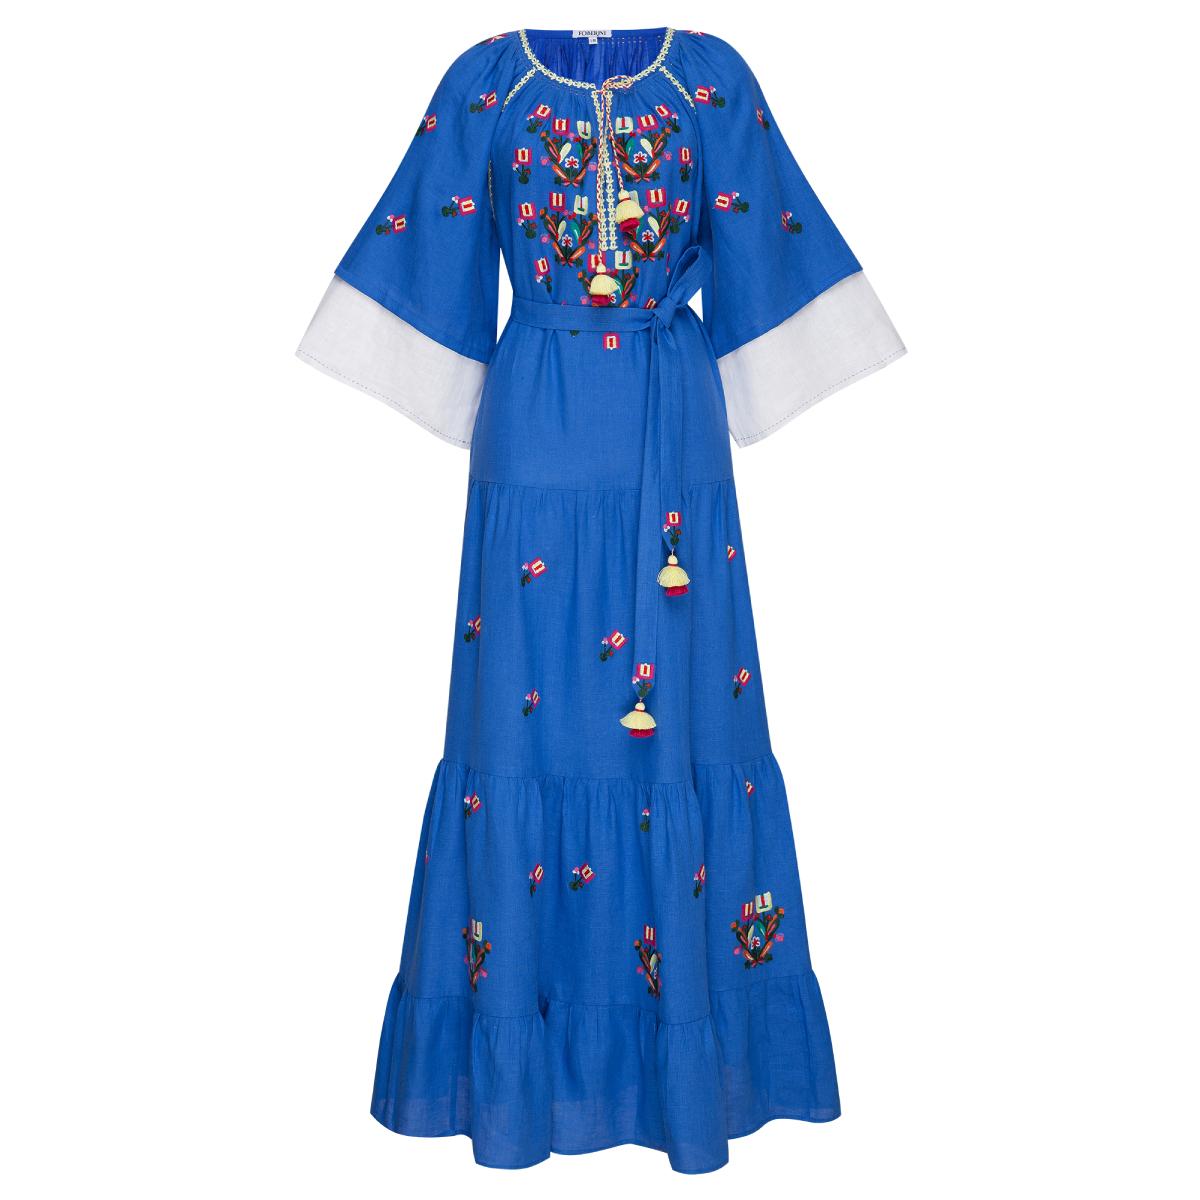 Omelia Chic Blue Maxi Dress